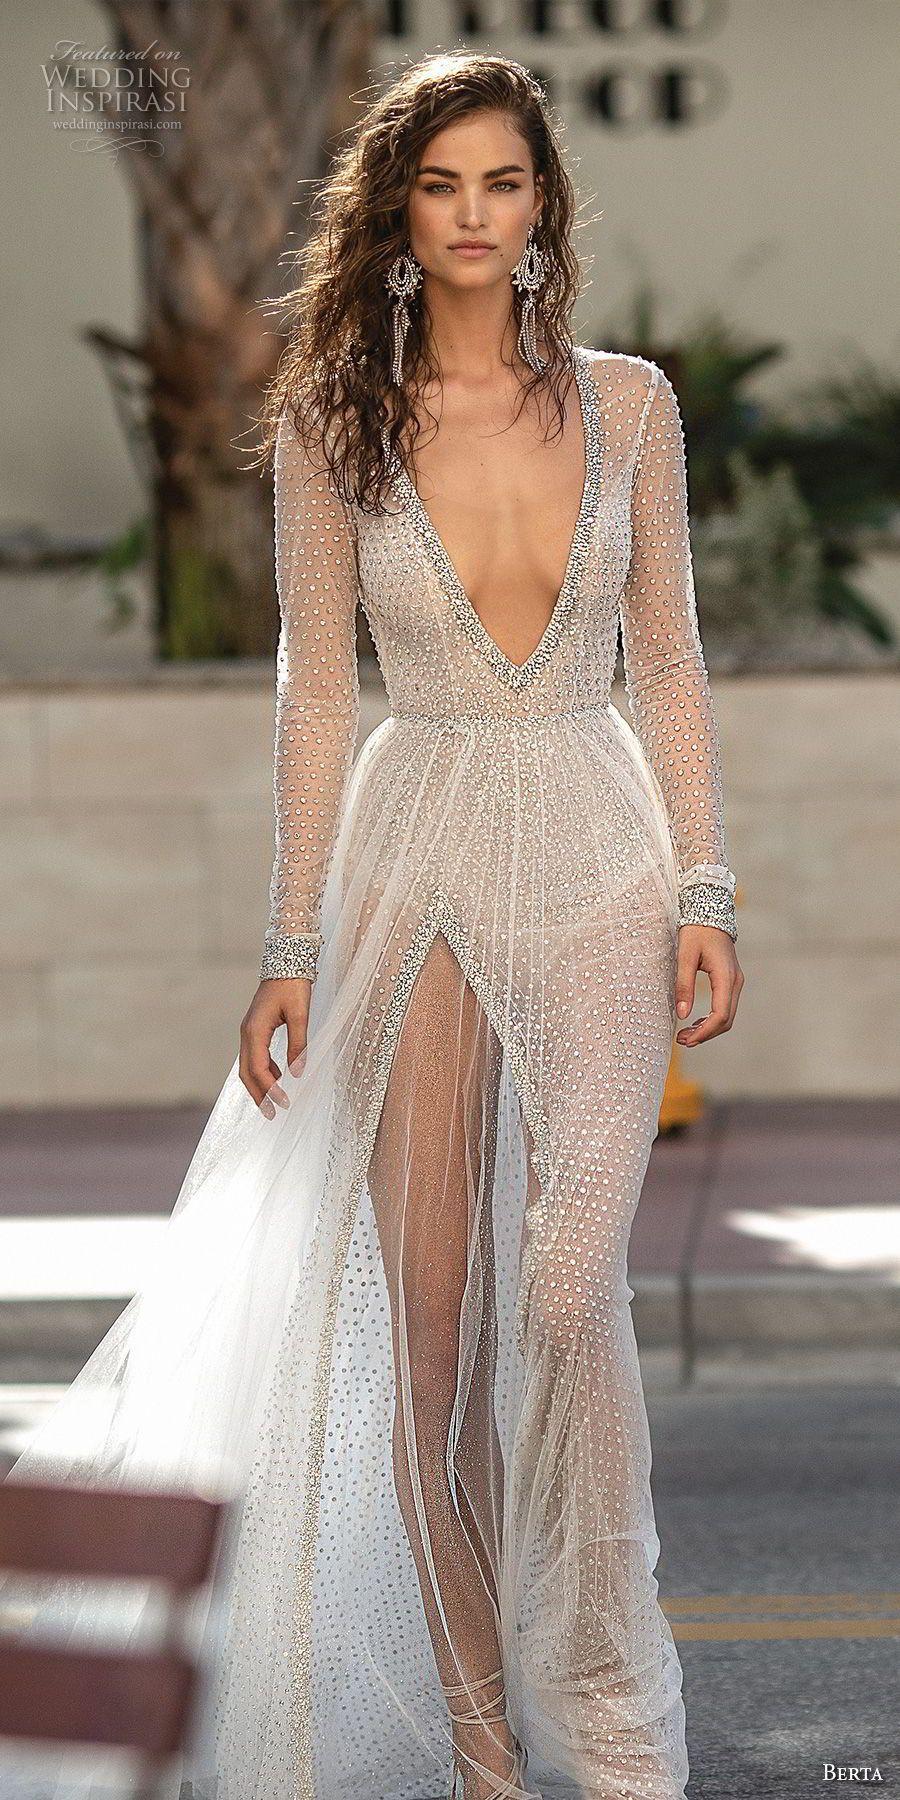 Berta spring wedding dresses u ucmiamiud bridal collection in